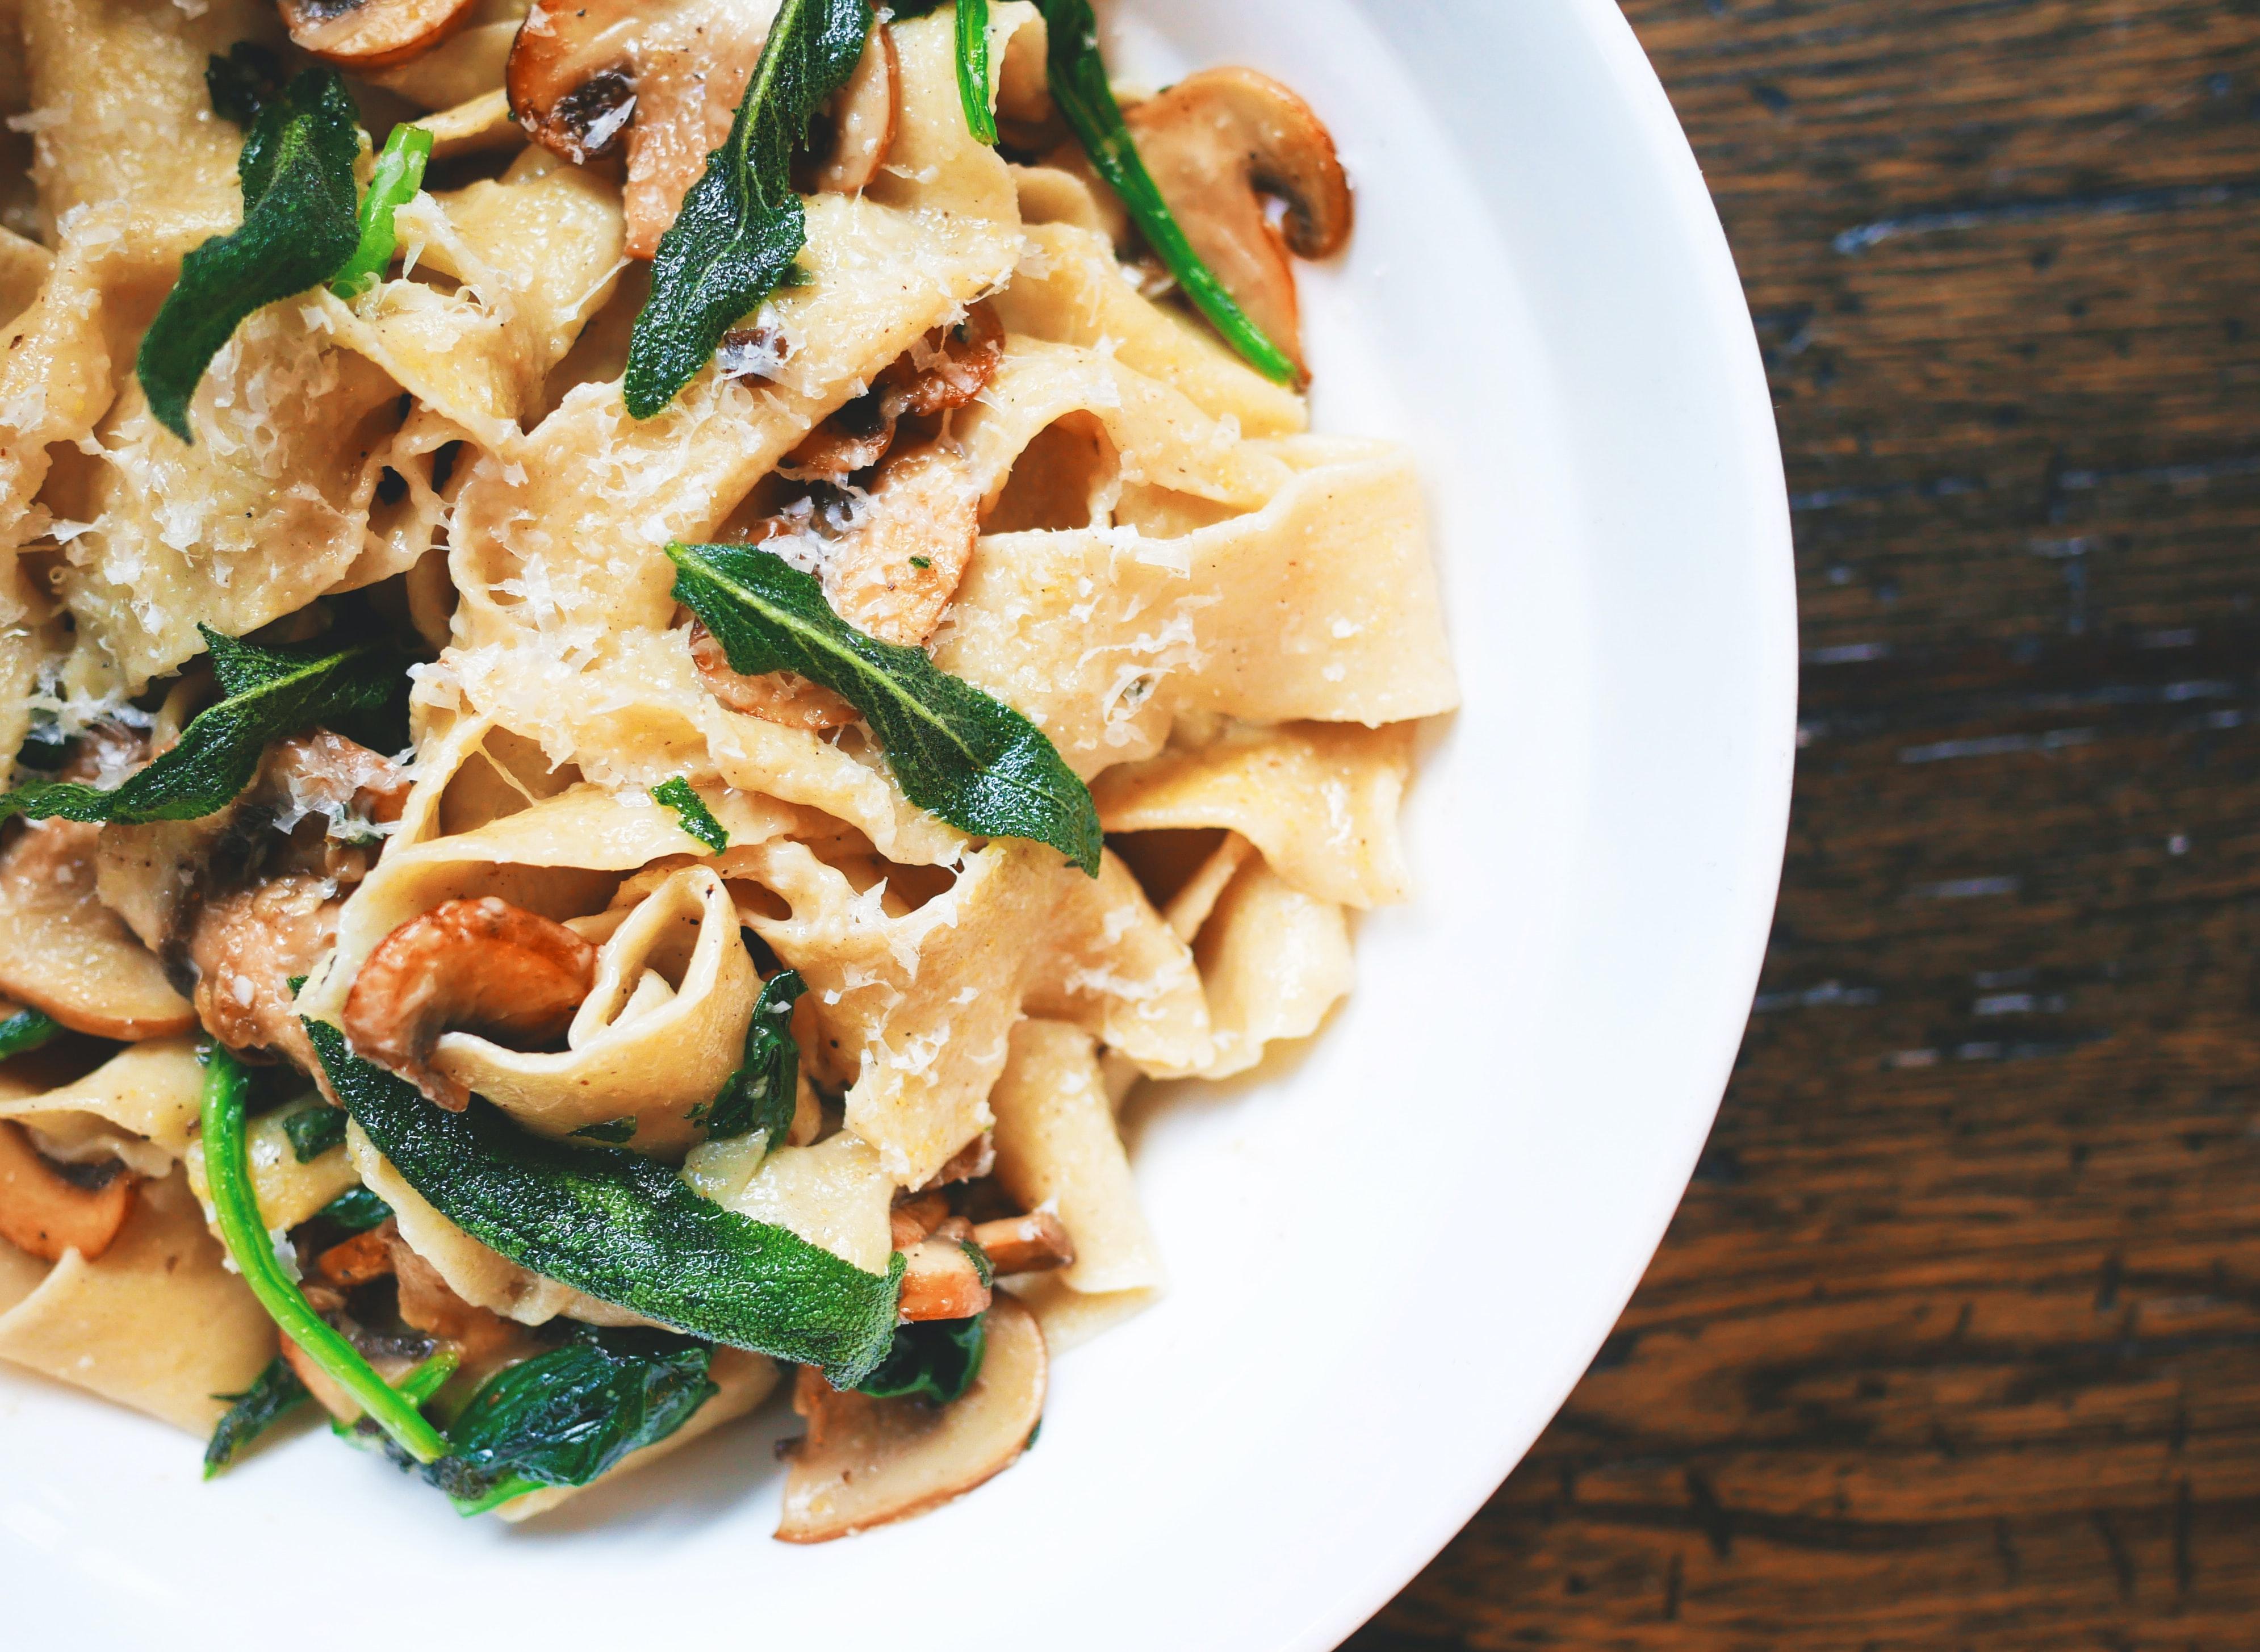 The Best Italian Restaurants in The Bronx